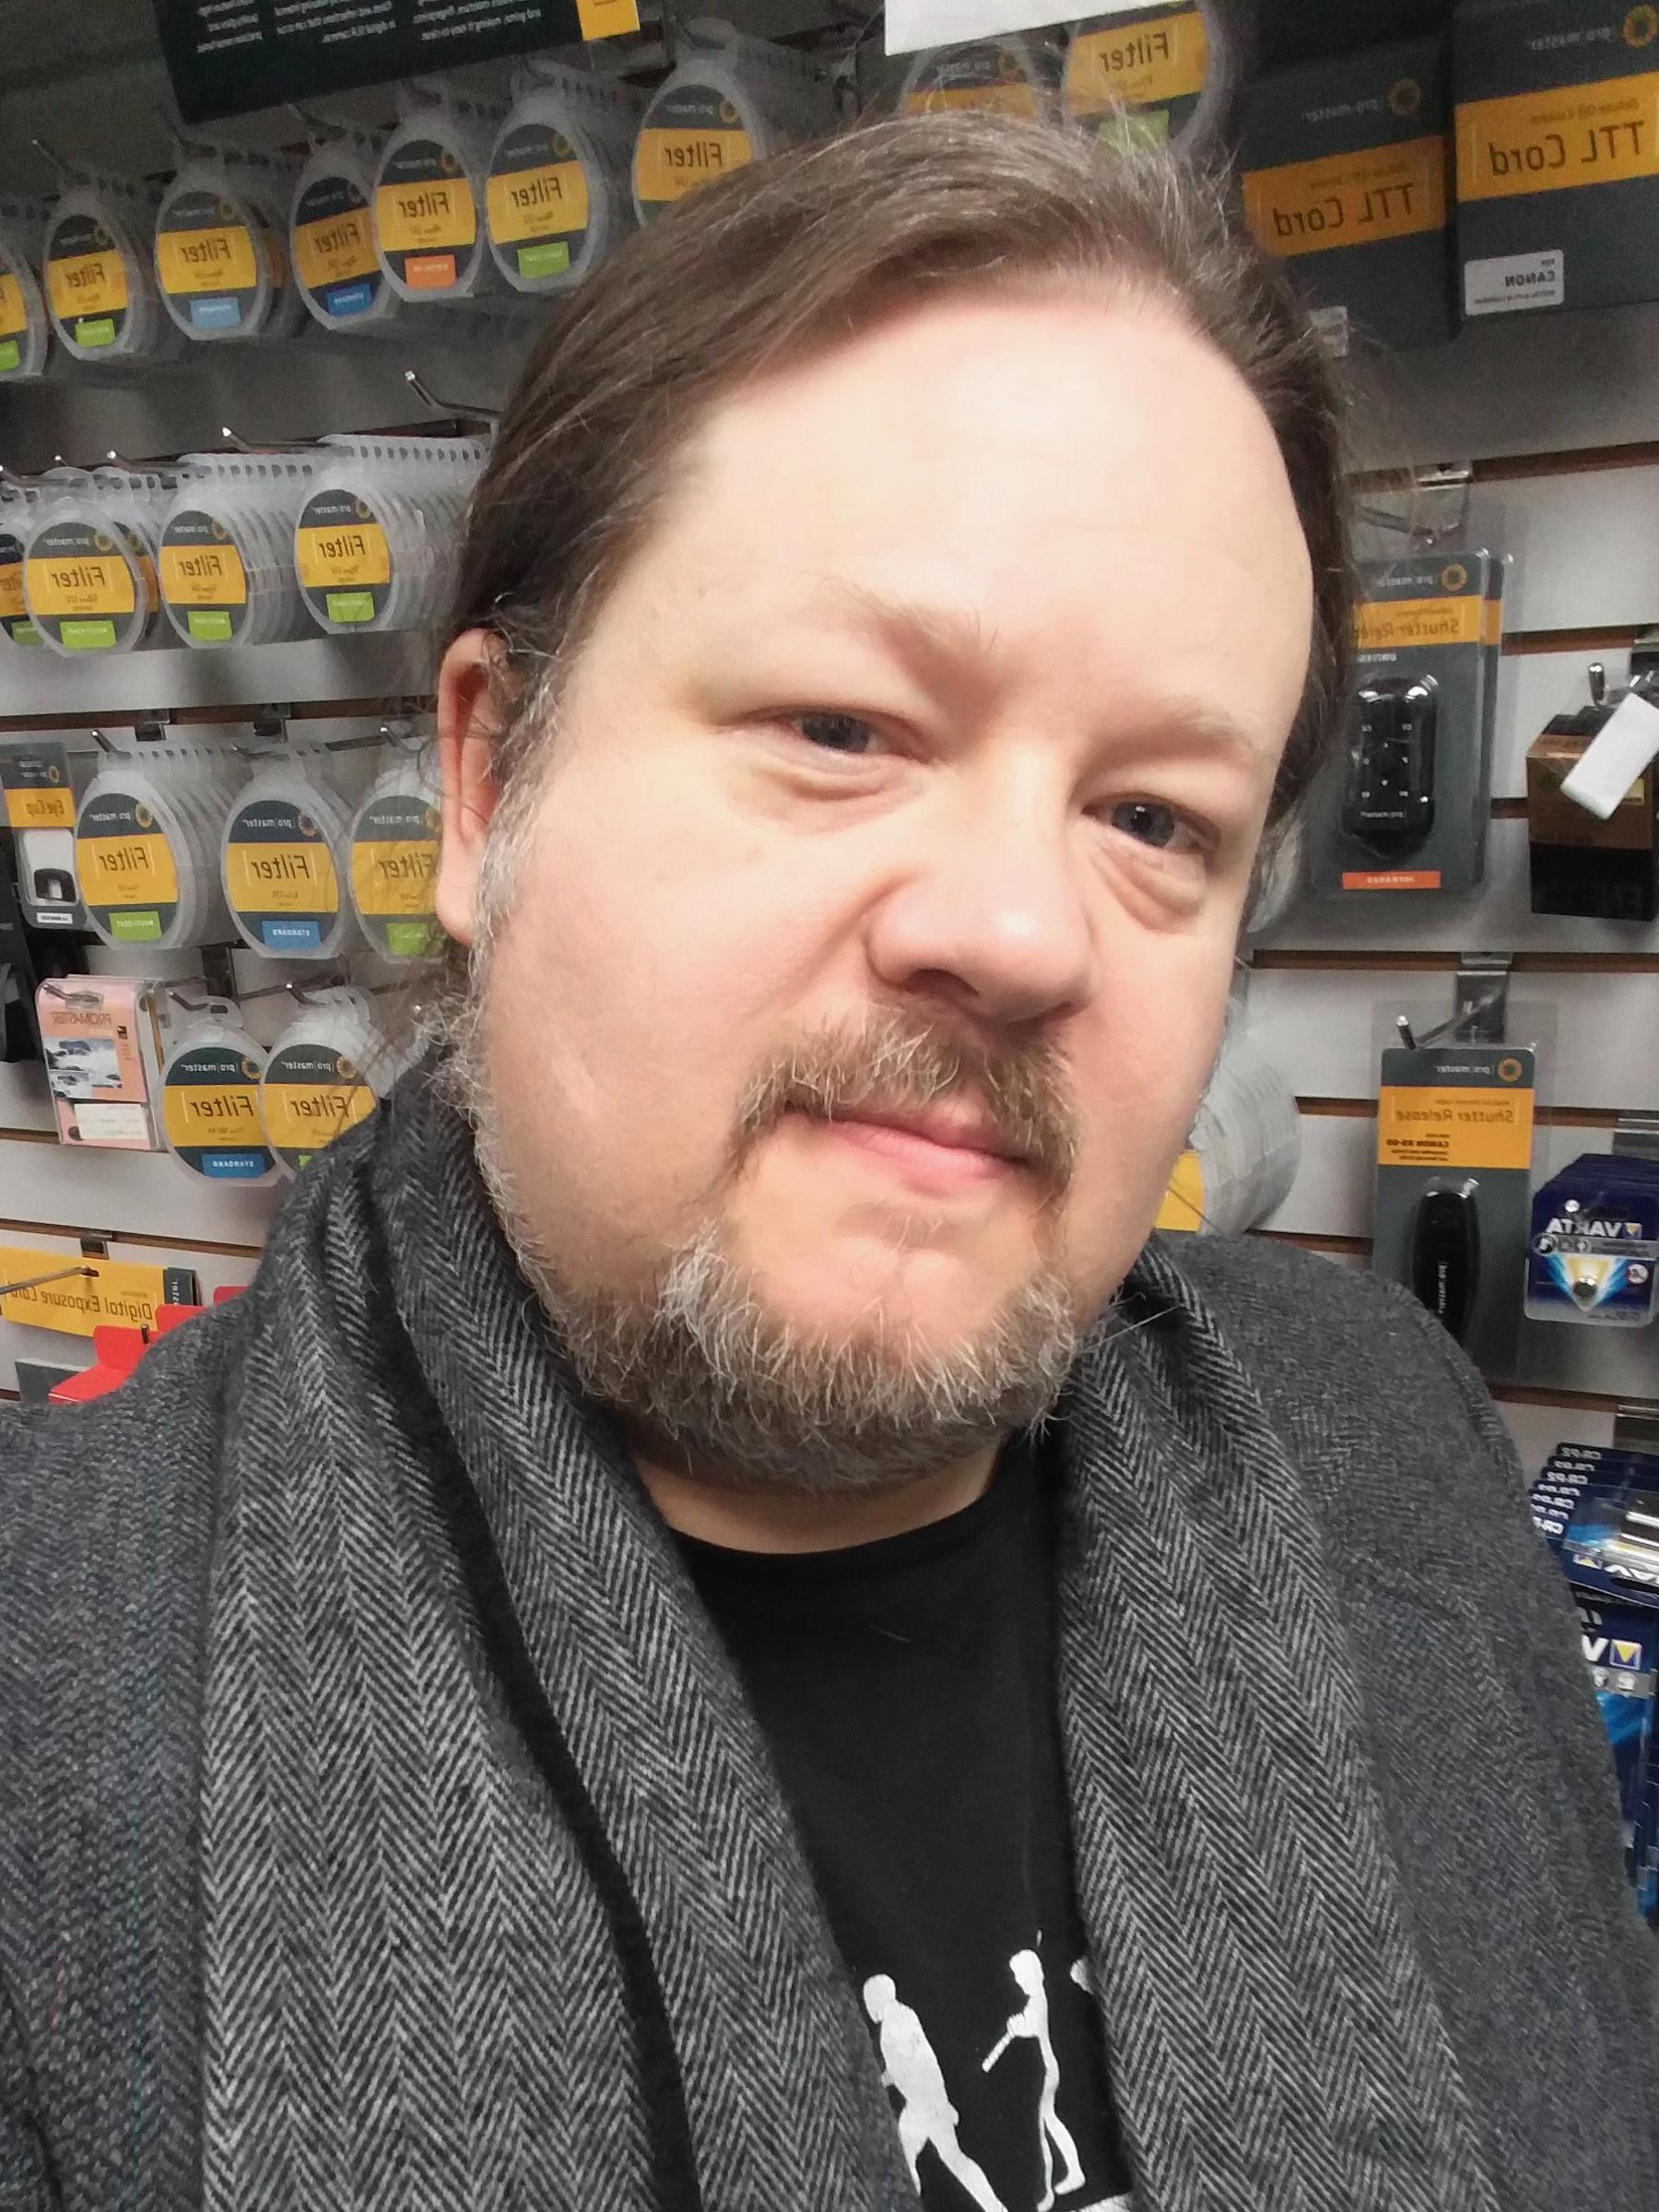 Kevin MacNutt, Store Manager